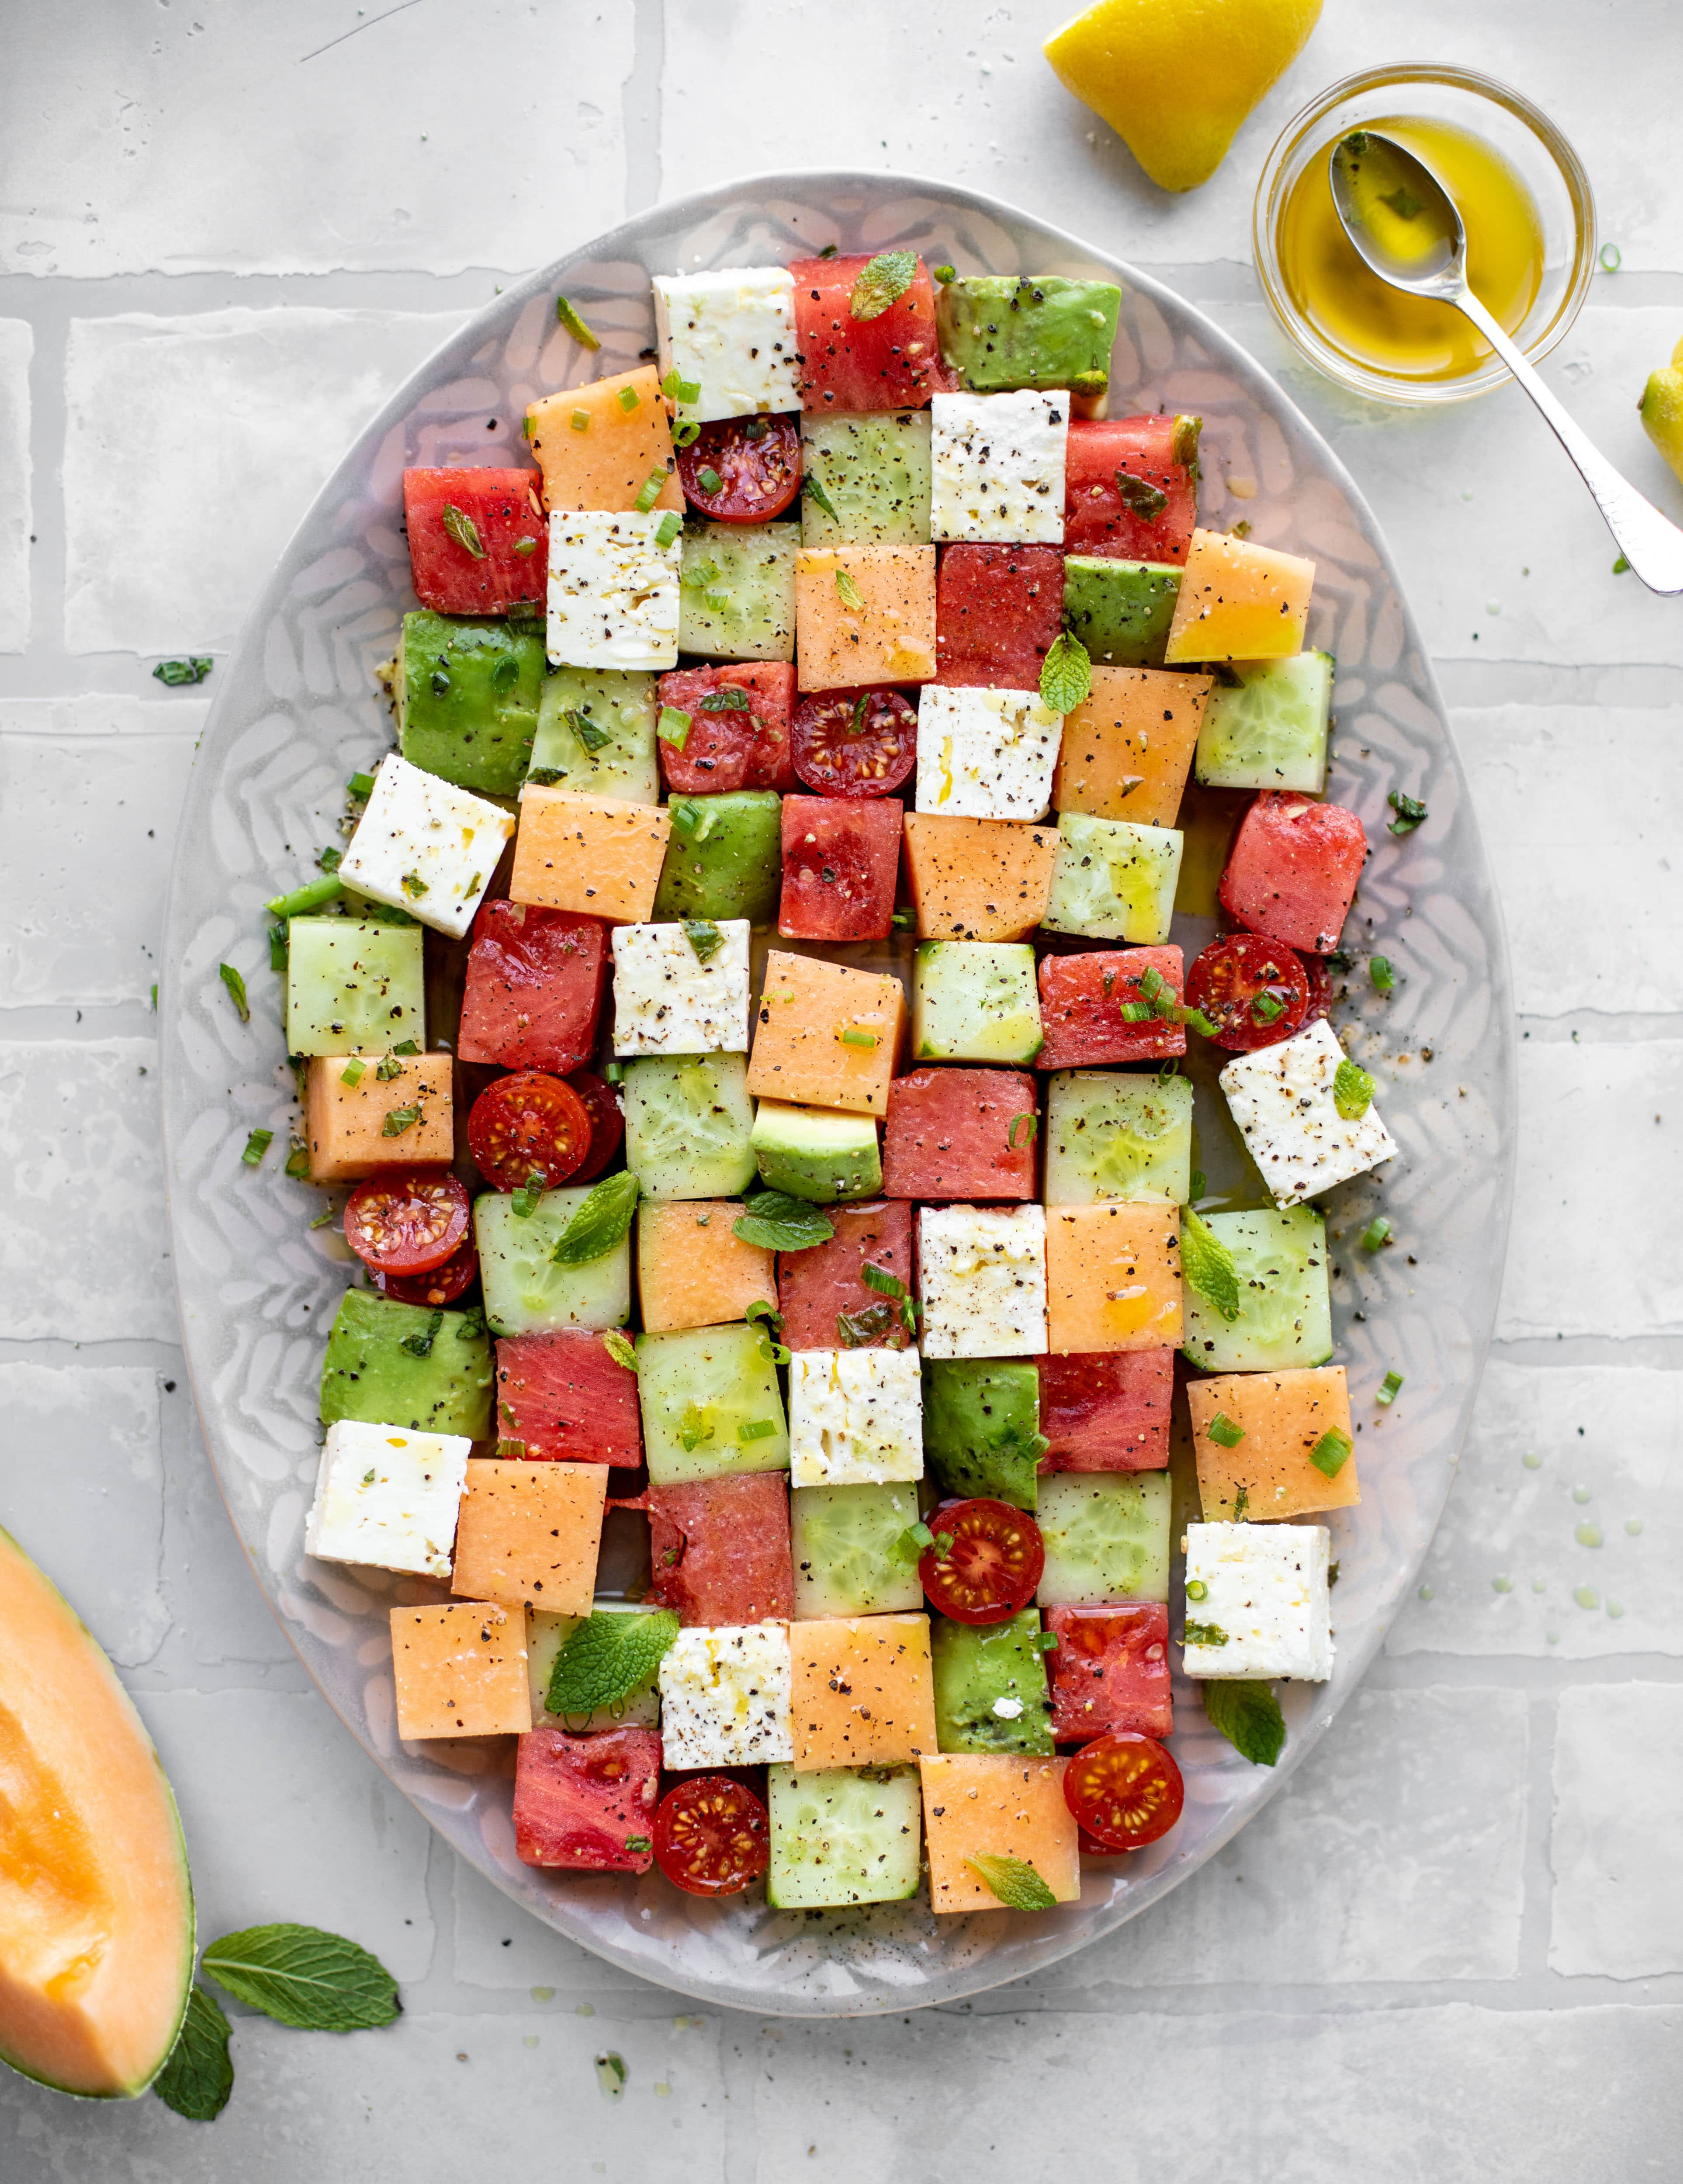 melon mosaic salad with hot honey vinaigrette